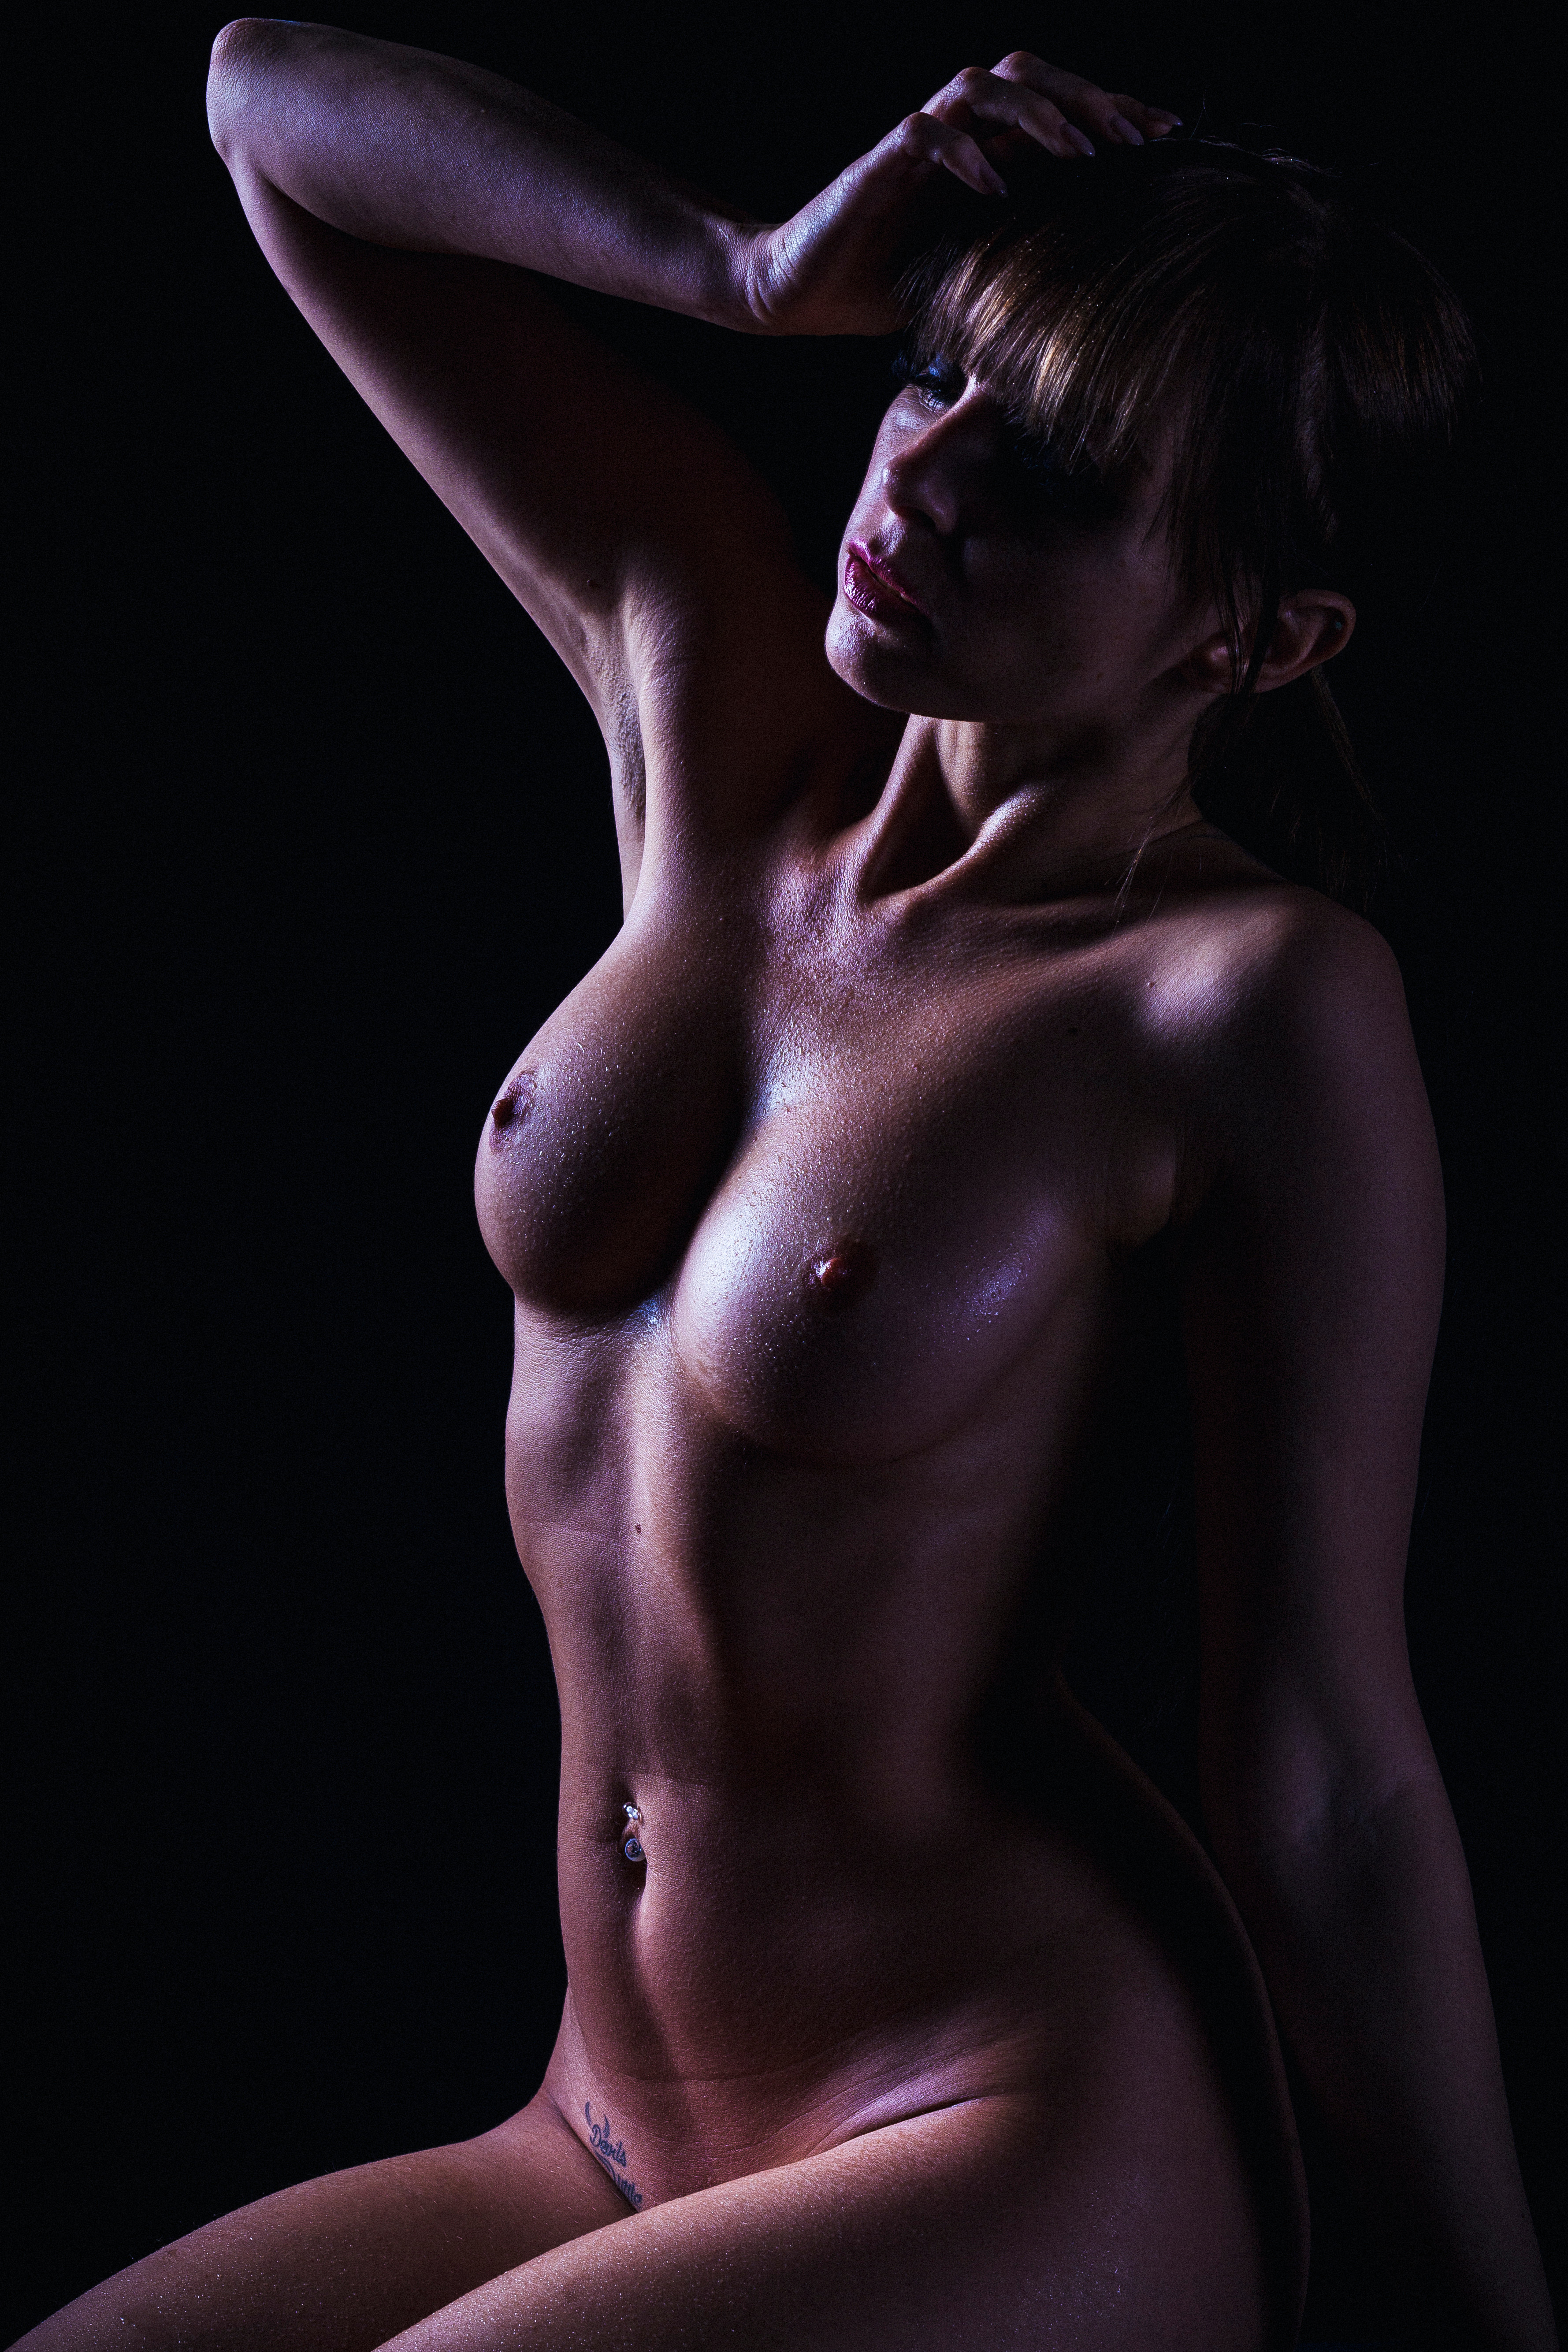 sensual Akt